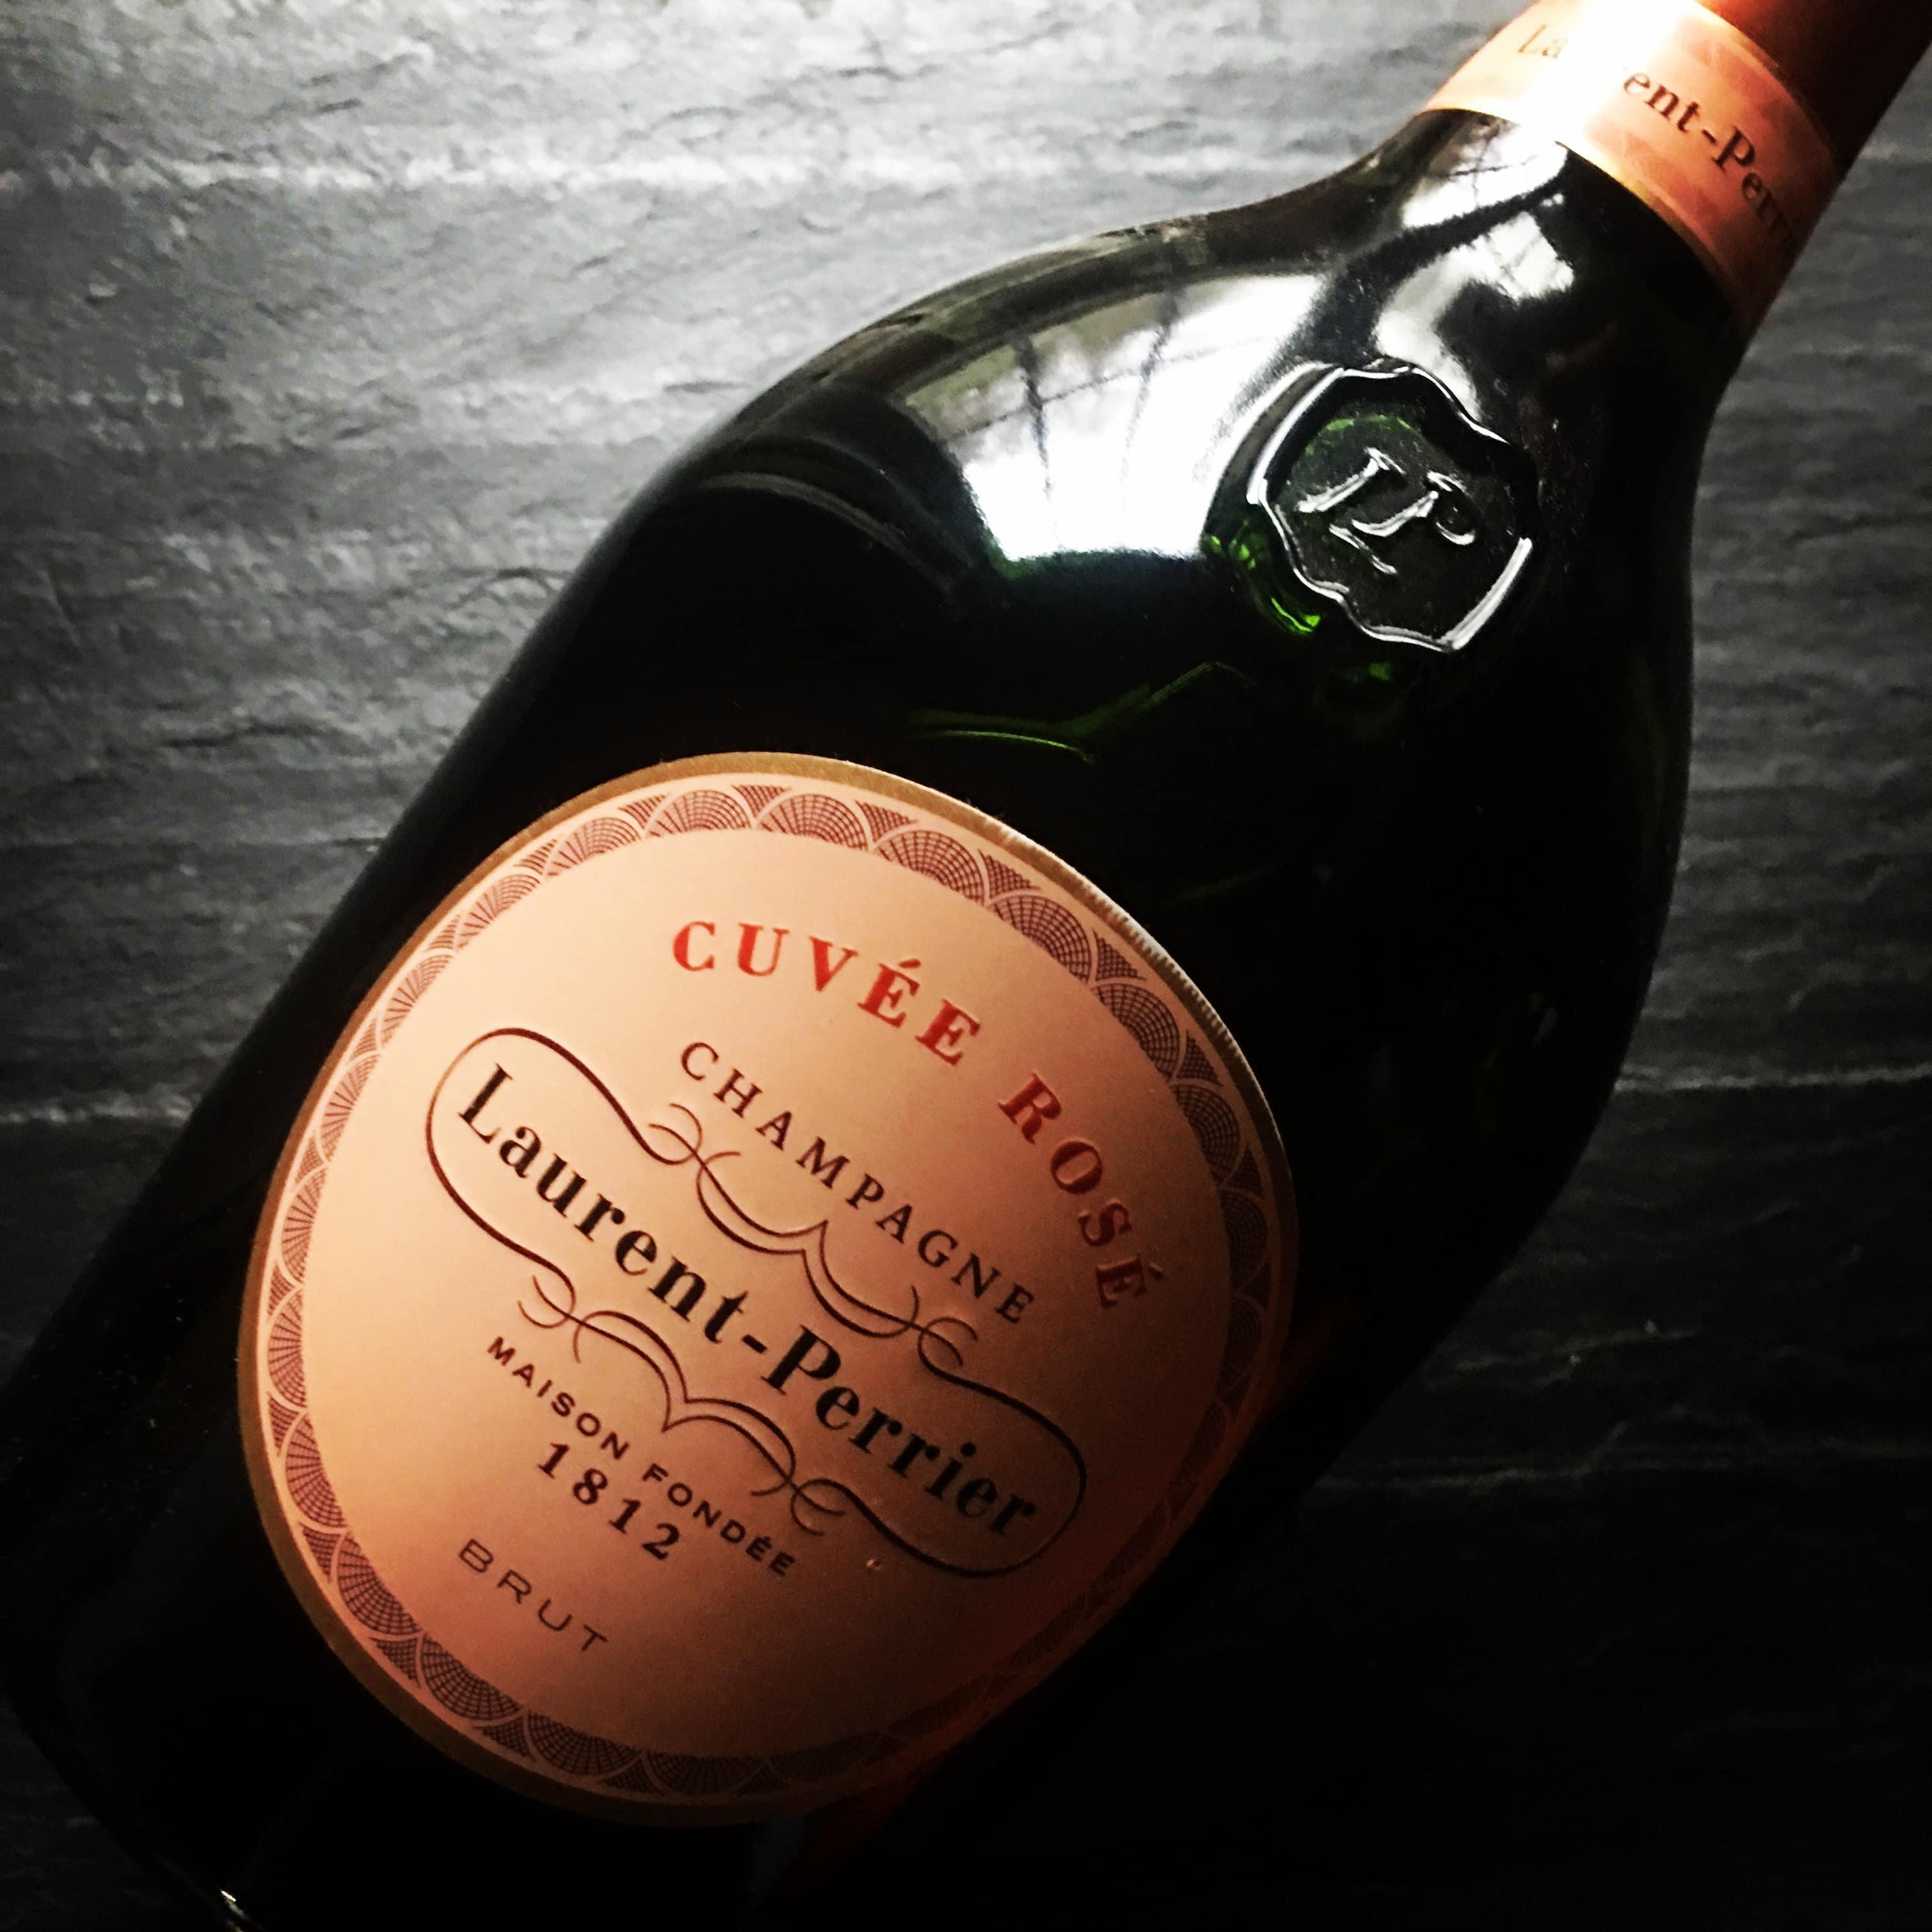 Laurent-Perrier Champagne Brut Cuvée Rosé NV